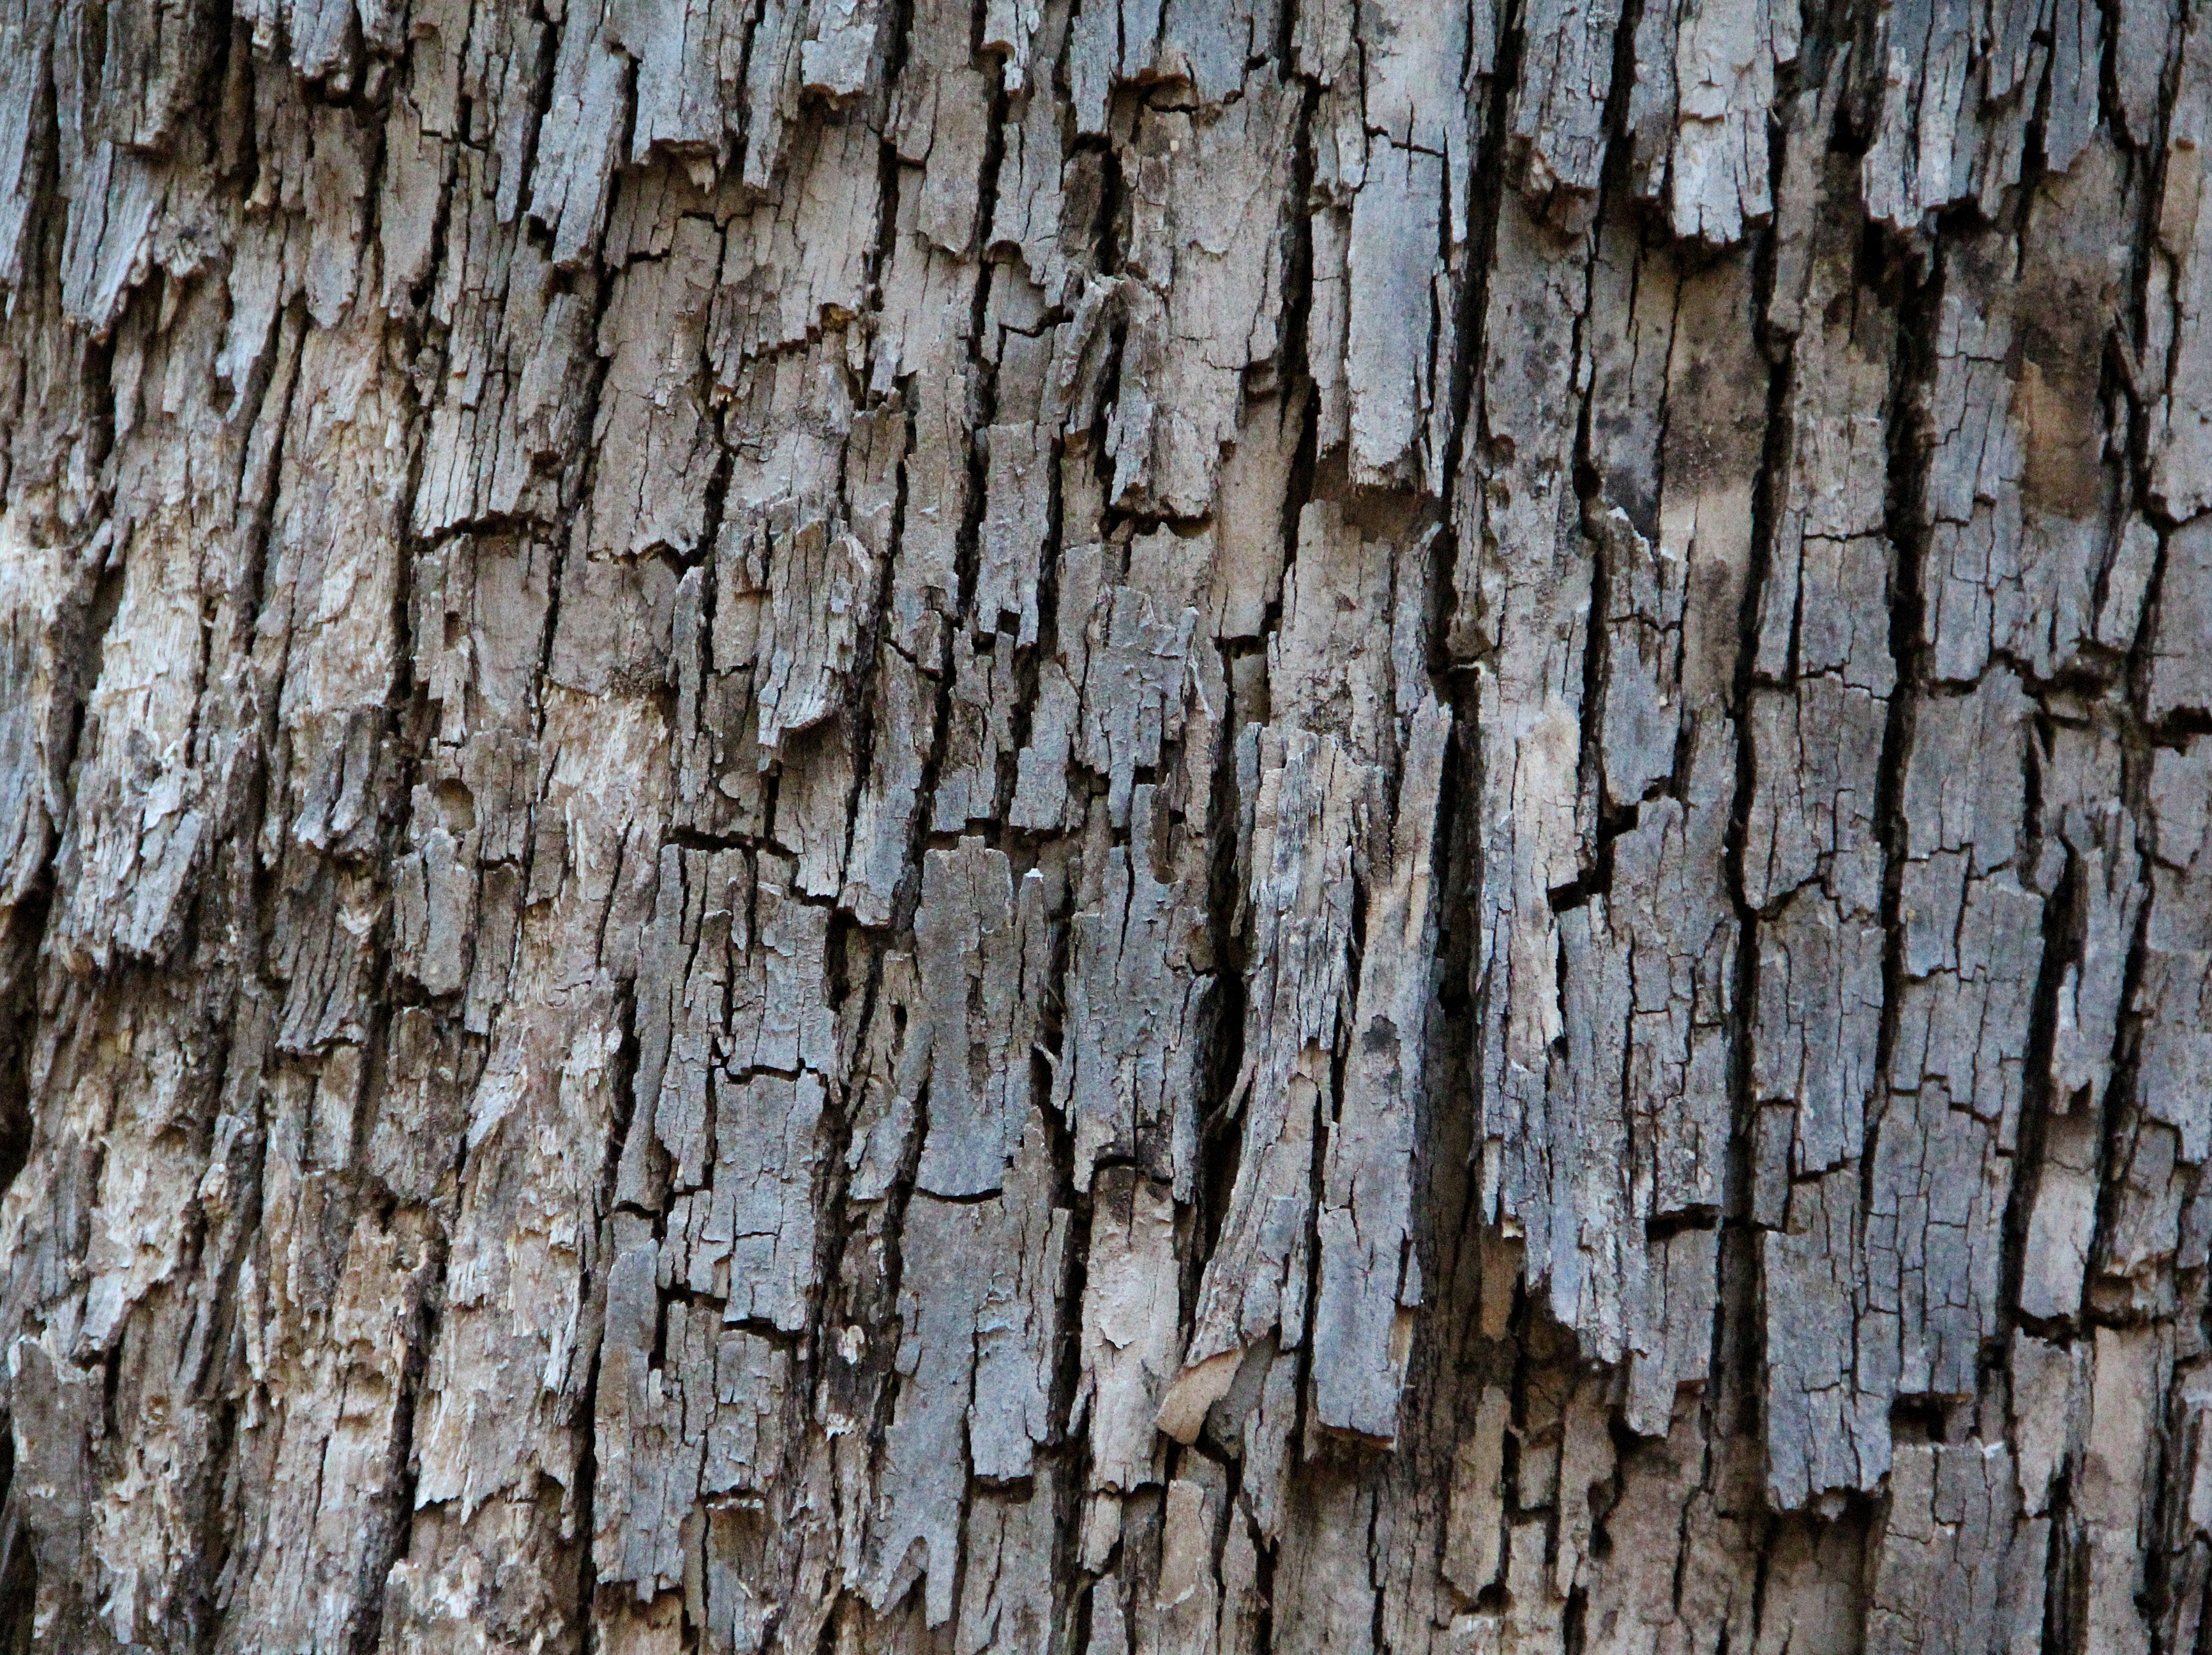 Wood bark texture photo